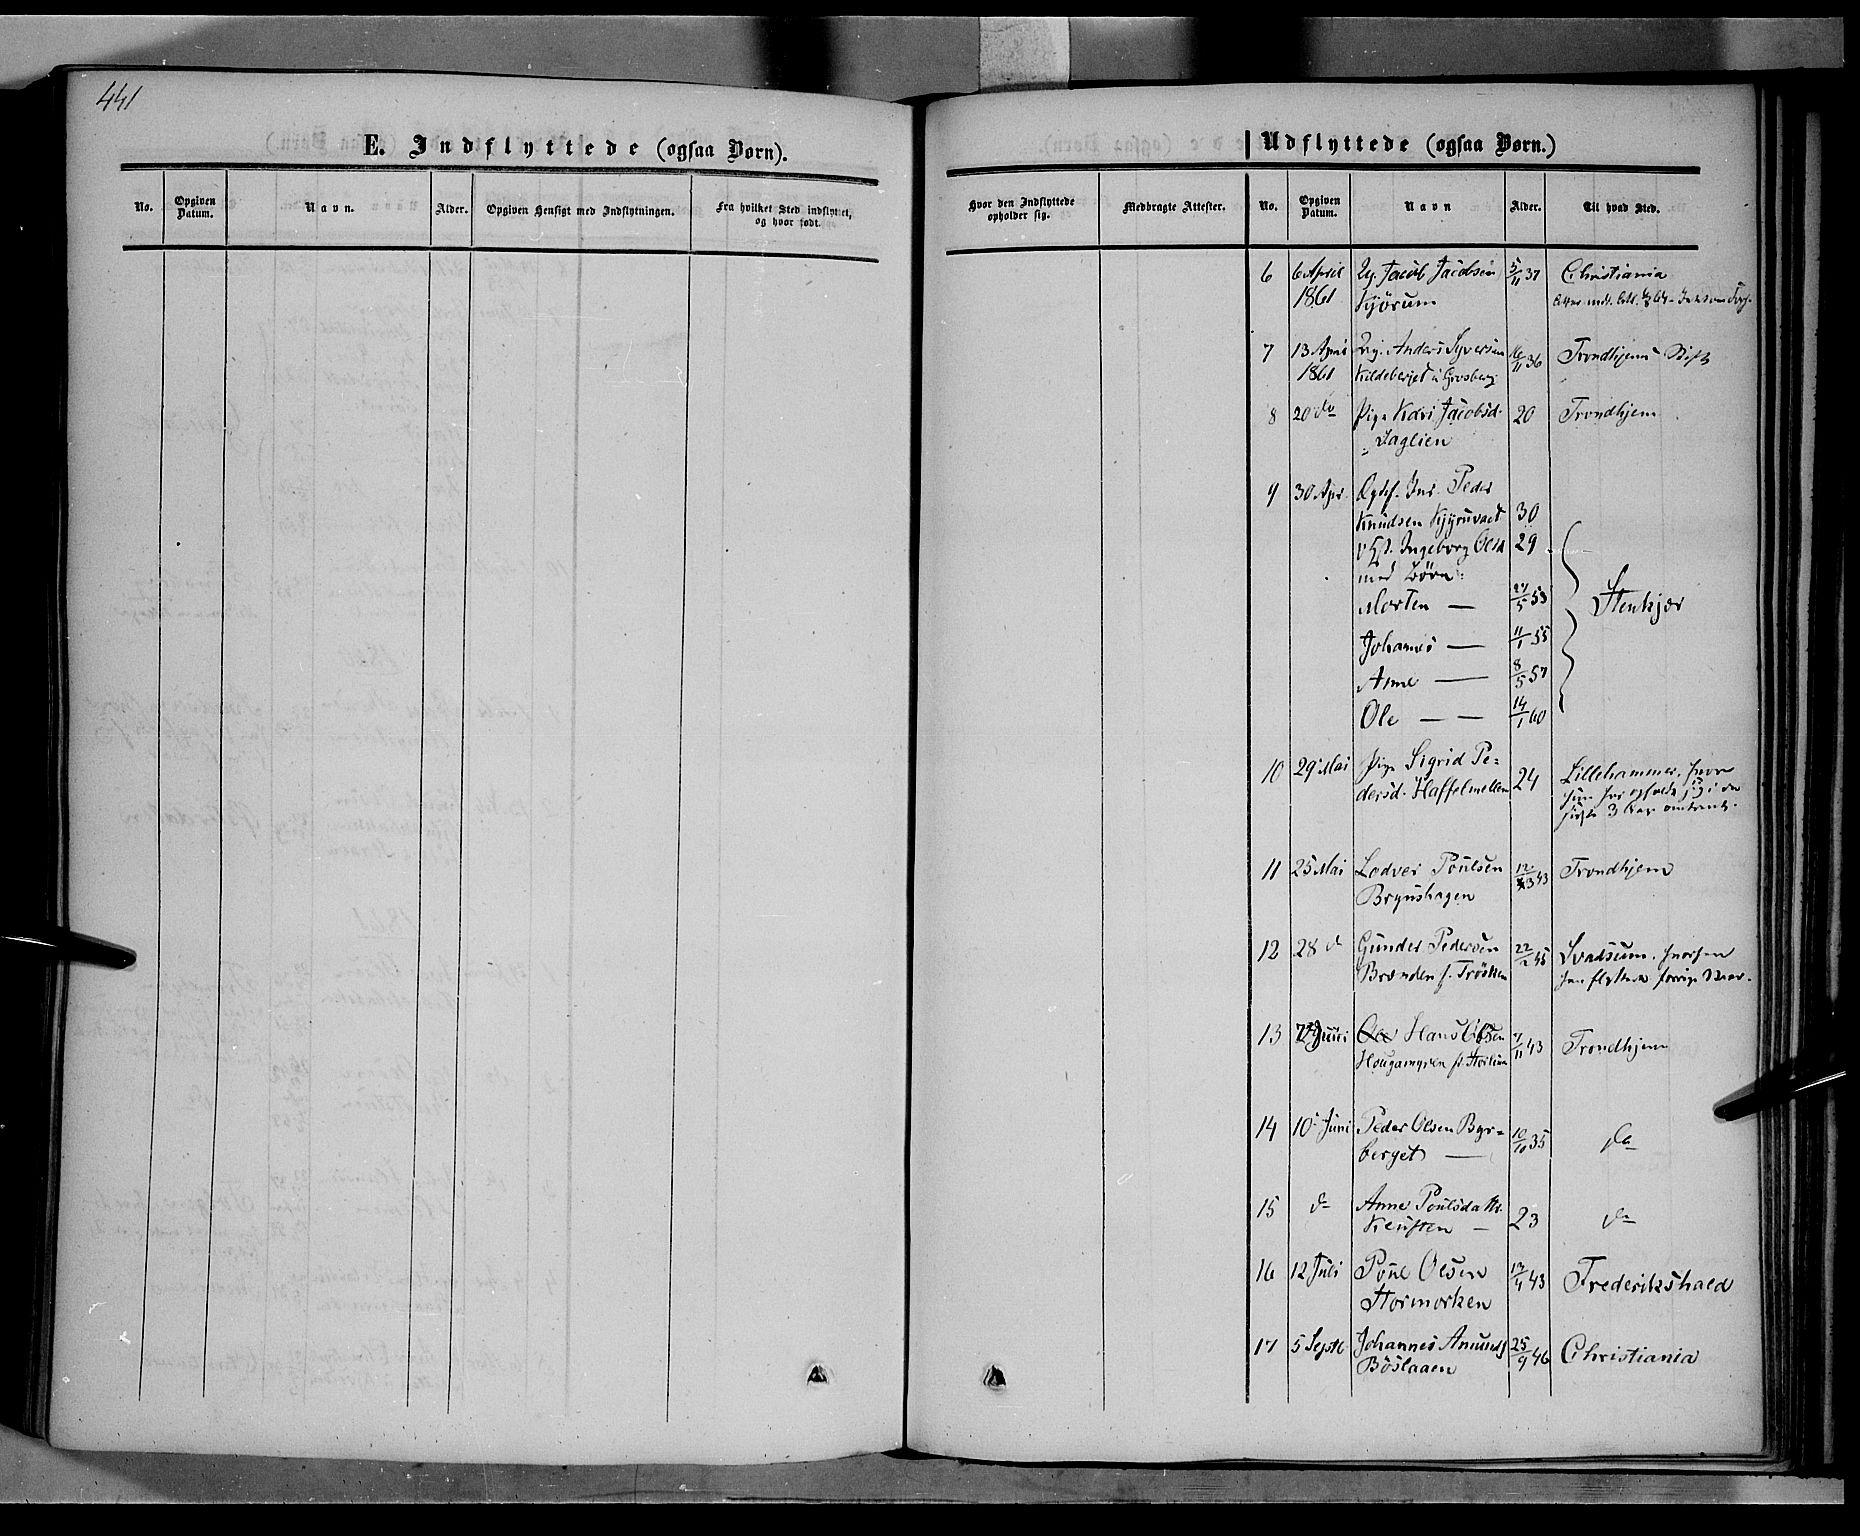 SAH, Nord-Fron prestekontor, Ministerialbok nr. 1, 1851-1864, s. 441